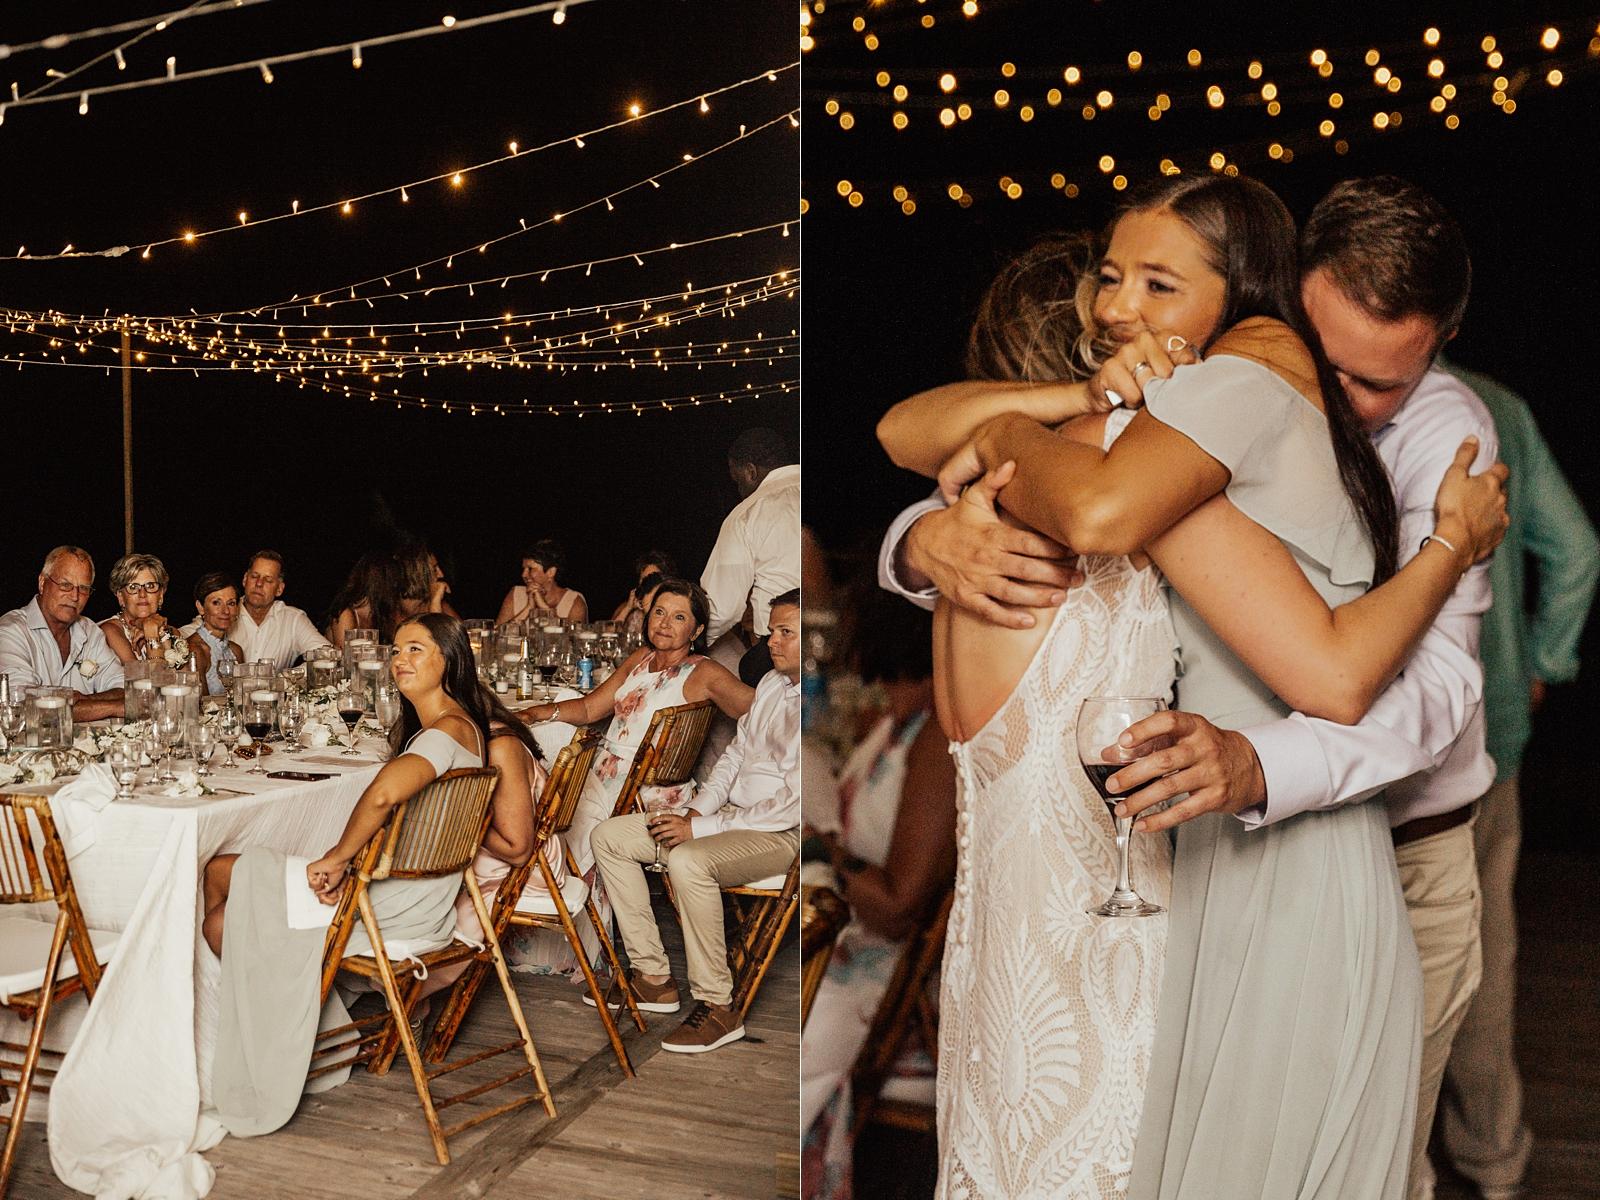 Jenni & Andrew Intimate Beach Destination Wedding in Little Exuma, Bahamas_0541.jpg